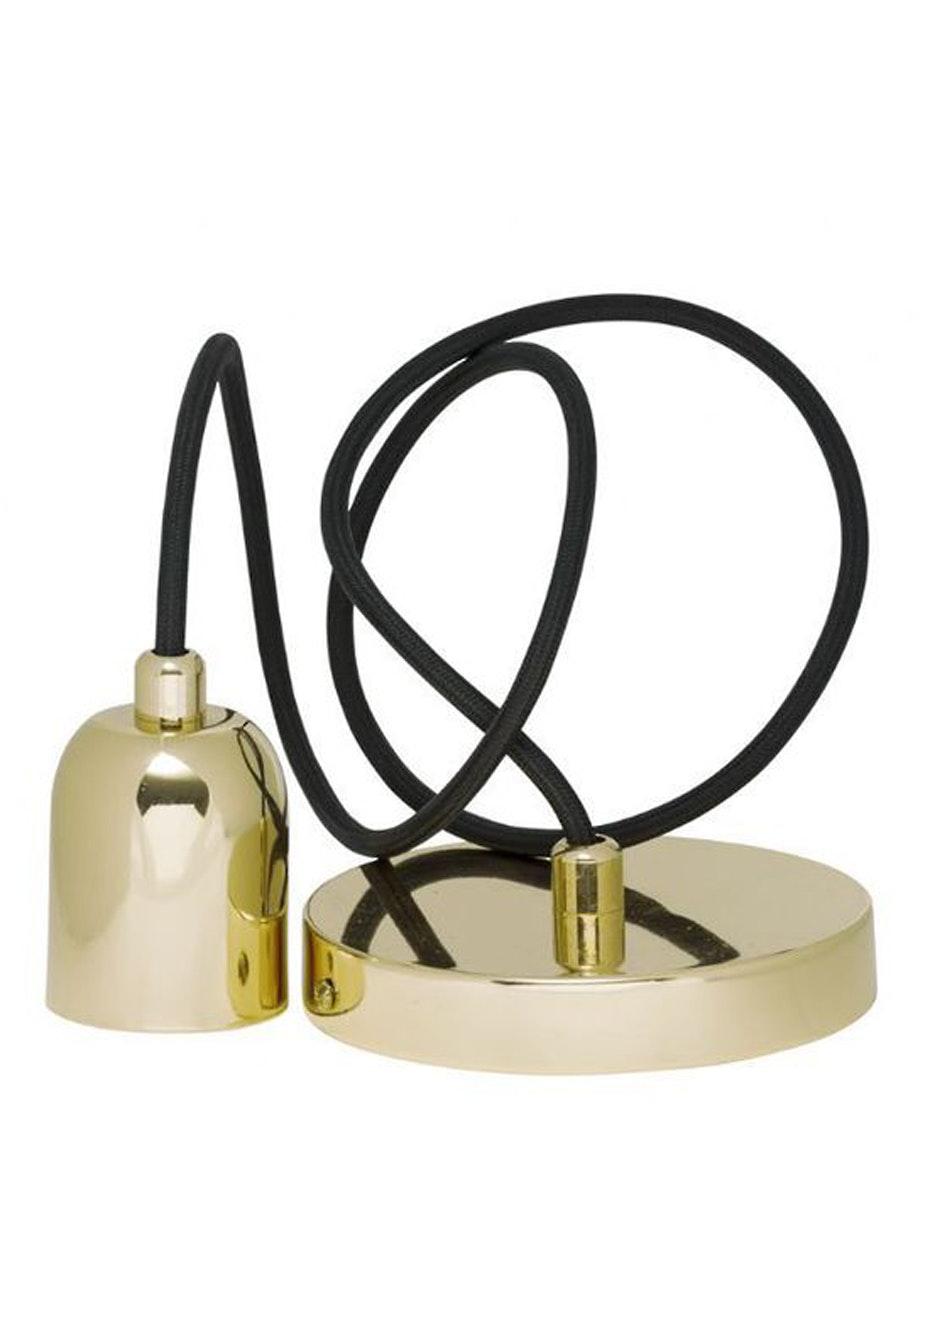 General Eclectic - Bulb Holder & Flex Brass